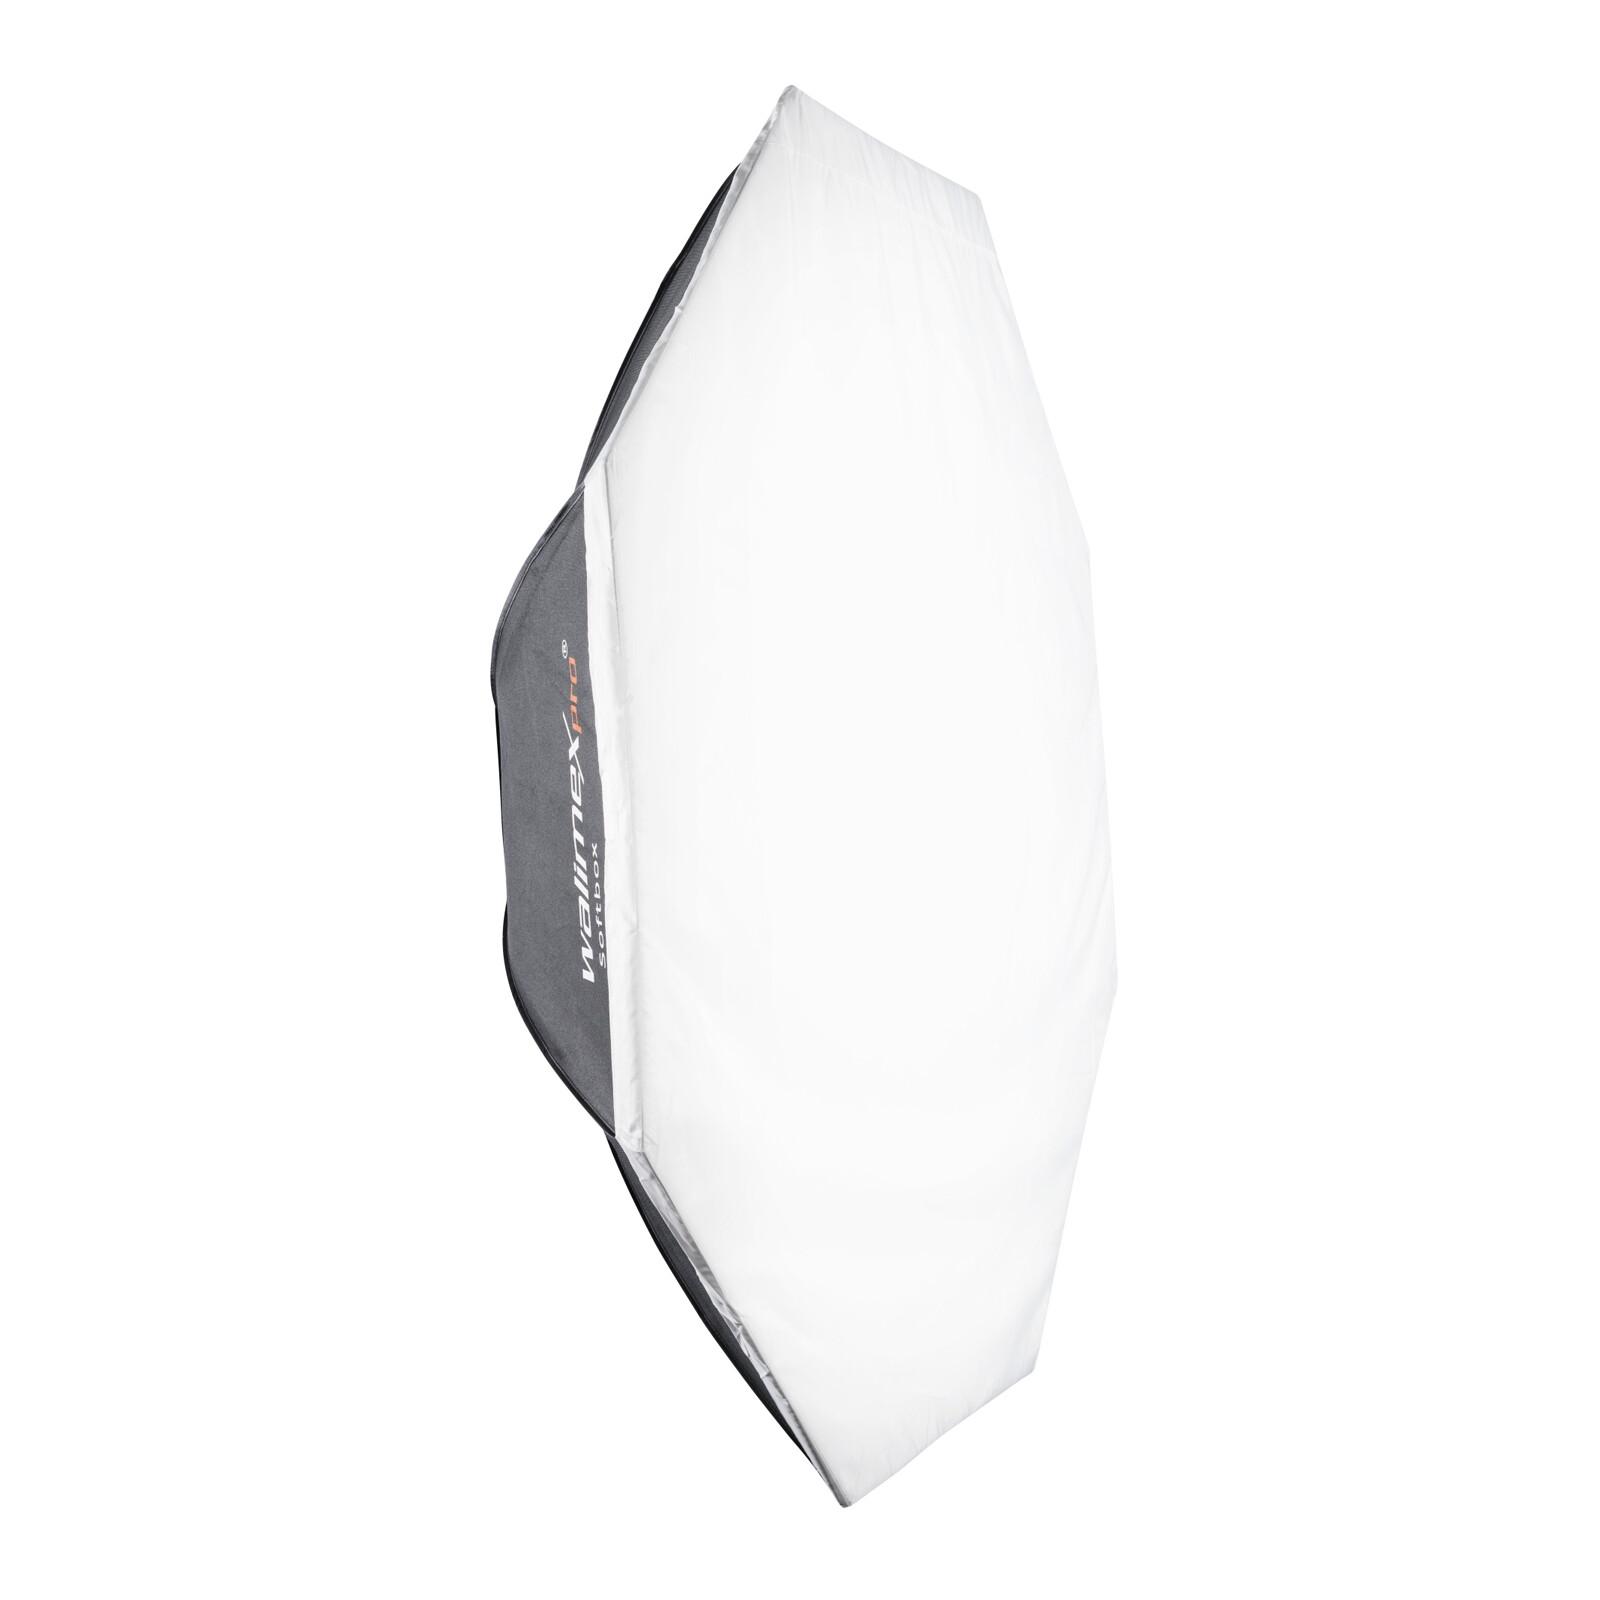 walimex pro Octagon Softbox Ø140cm Electra small